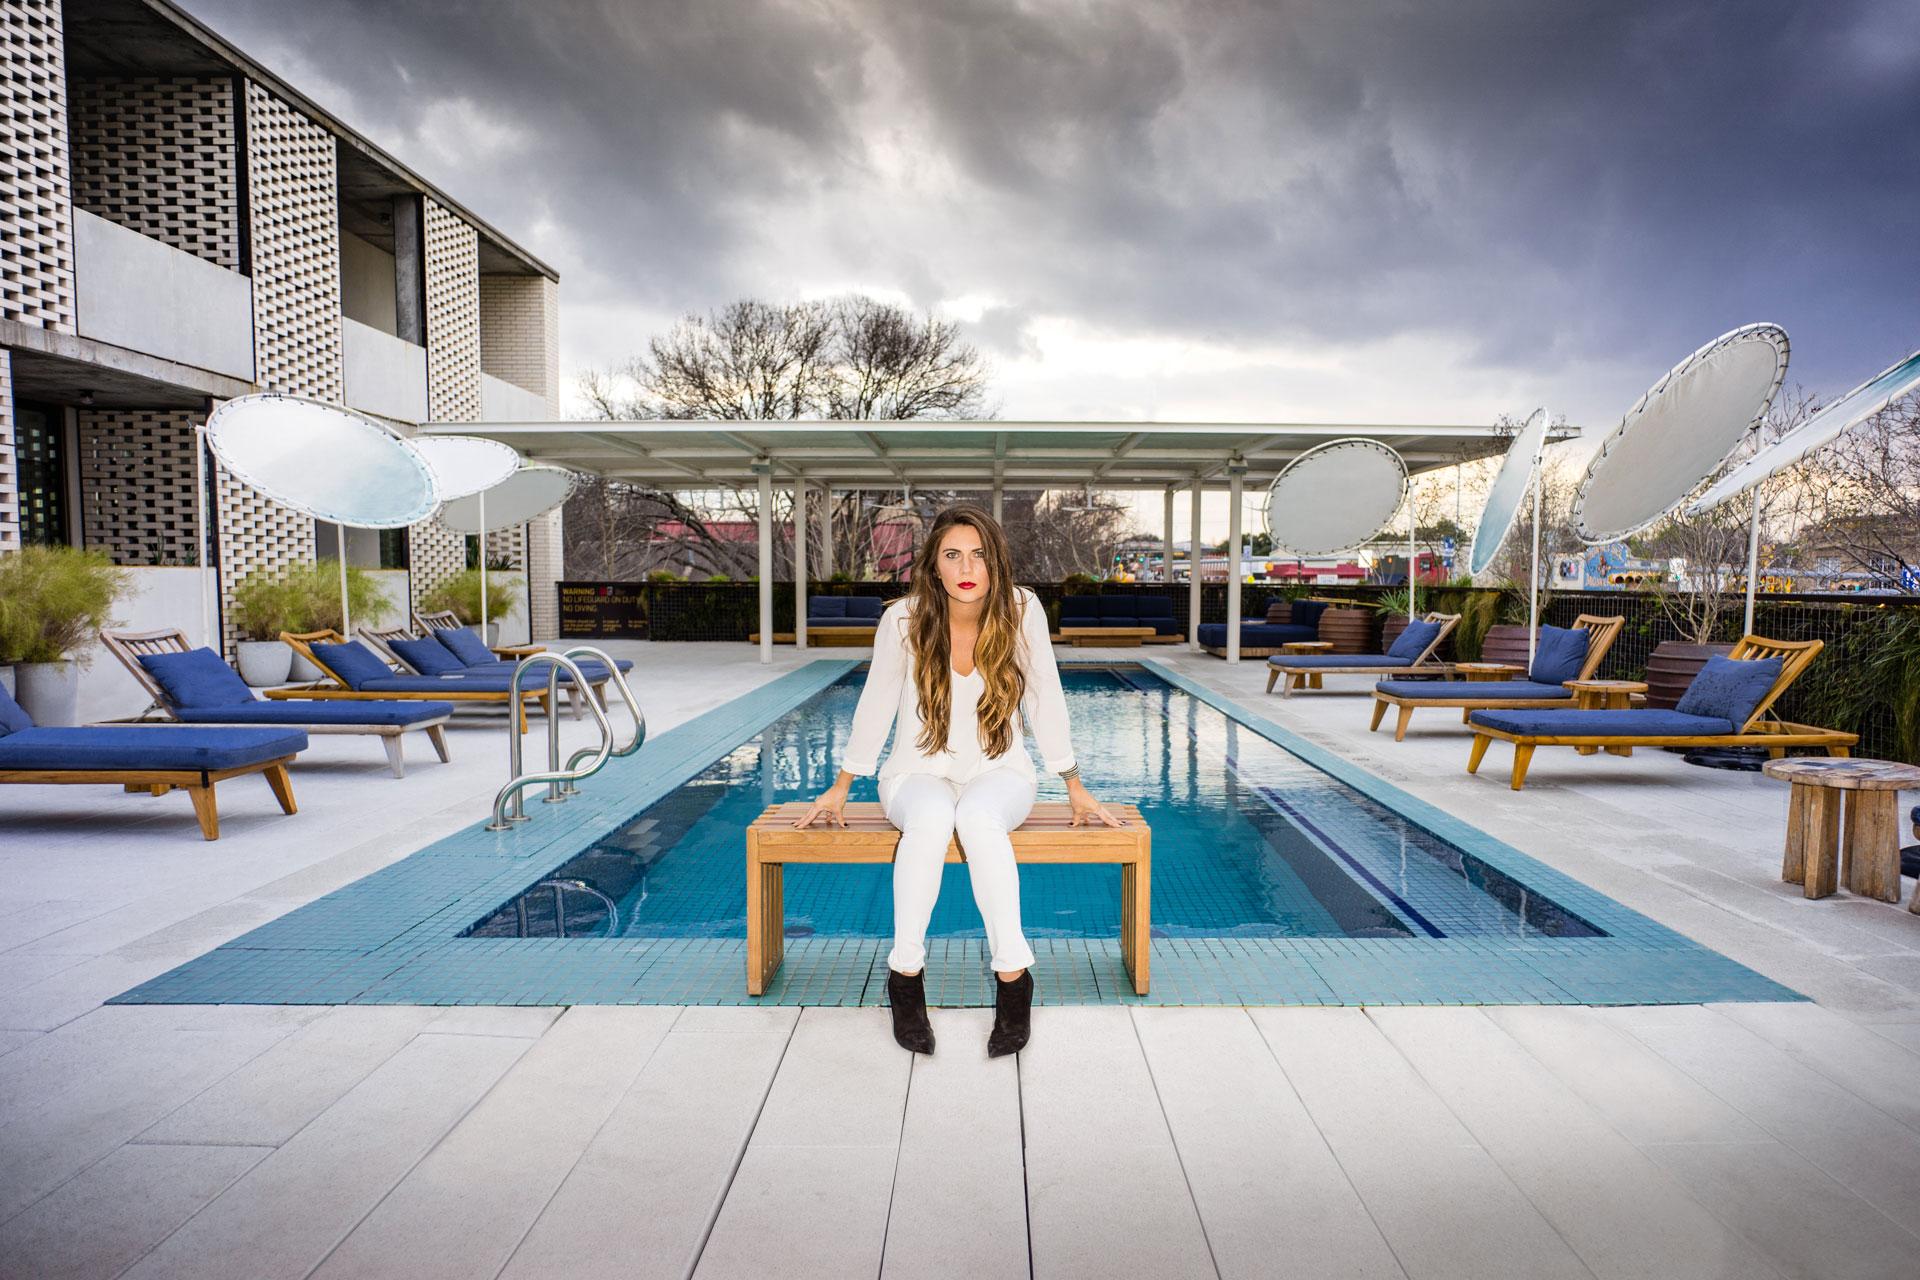 Amanda Morris Portrait South Congress Hotel Pool